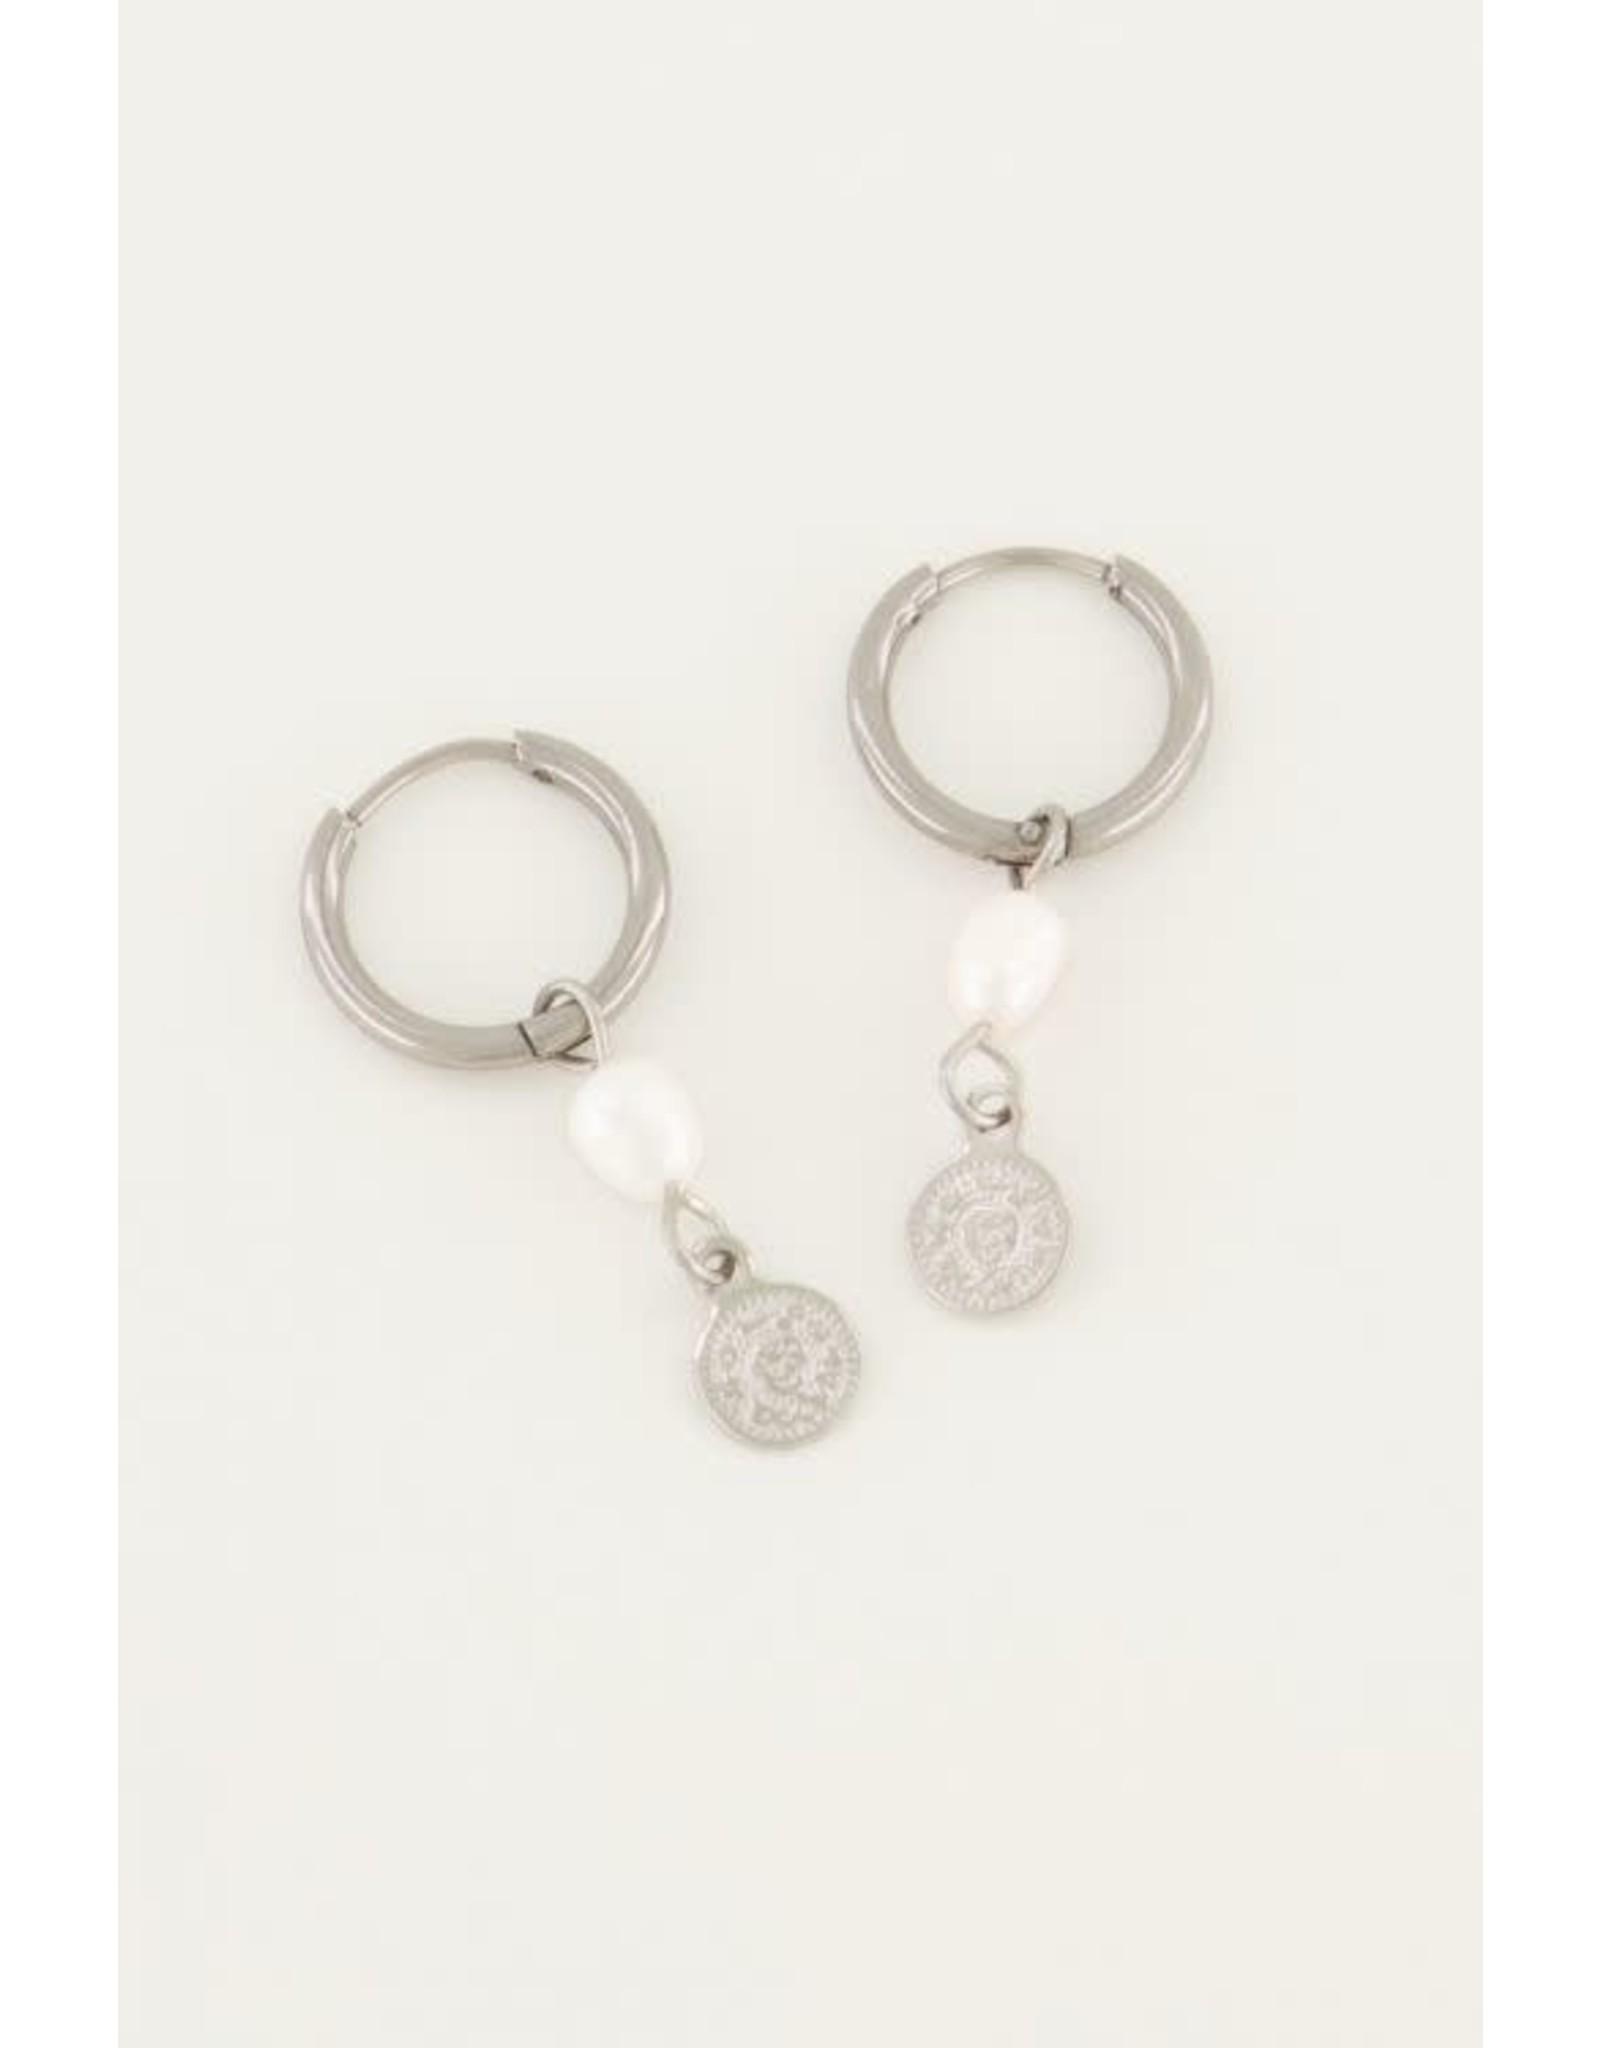 My Jewellery My Jewellery oorringen parel en munt